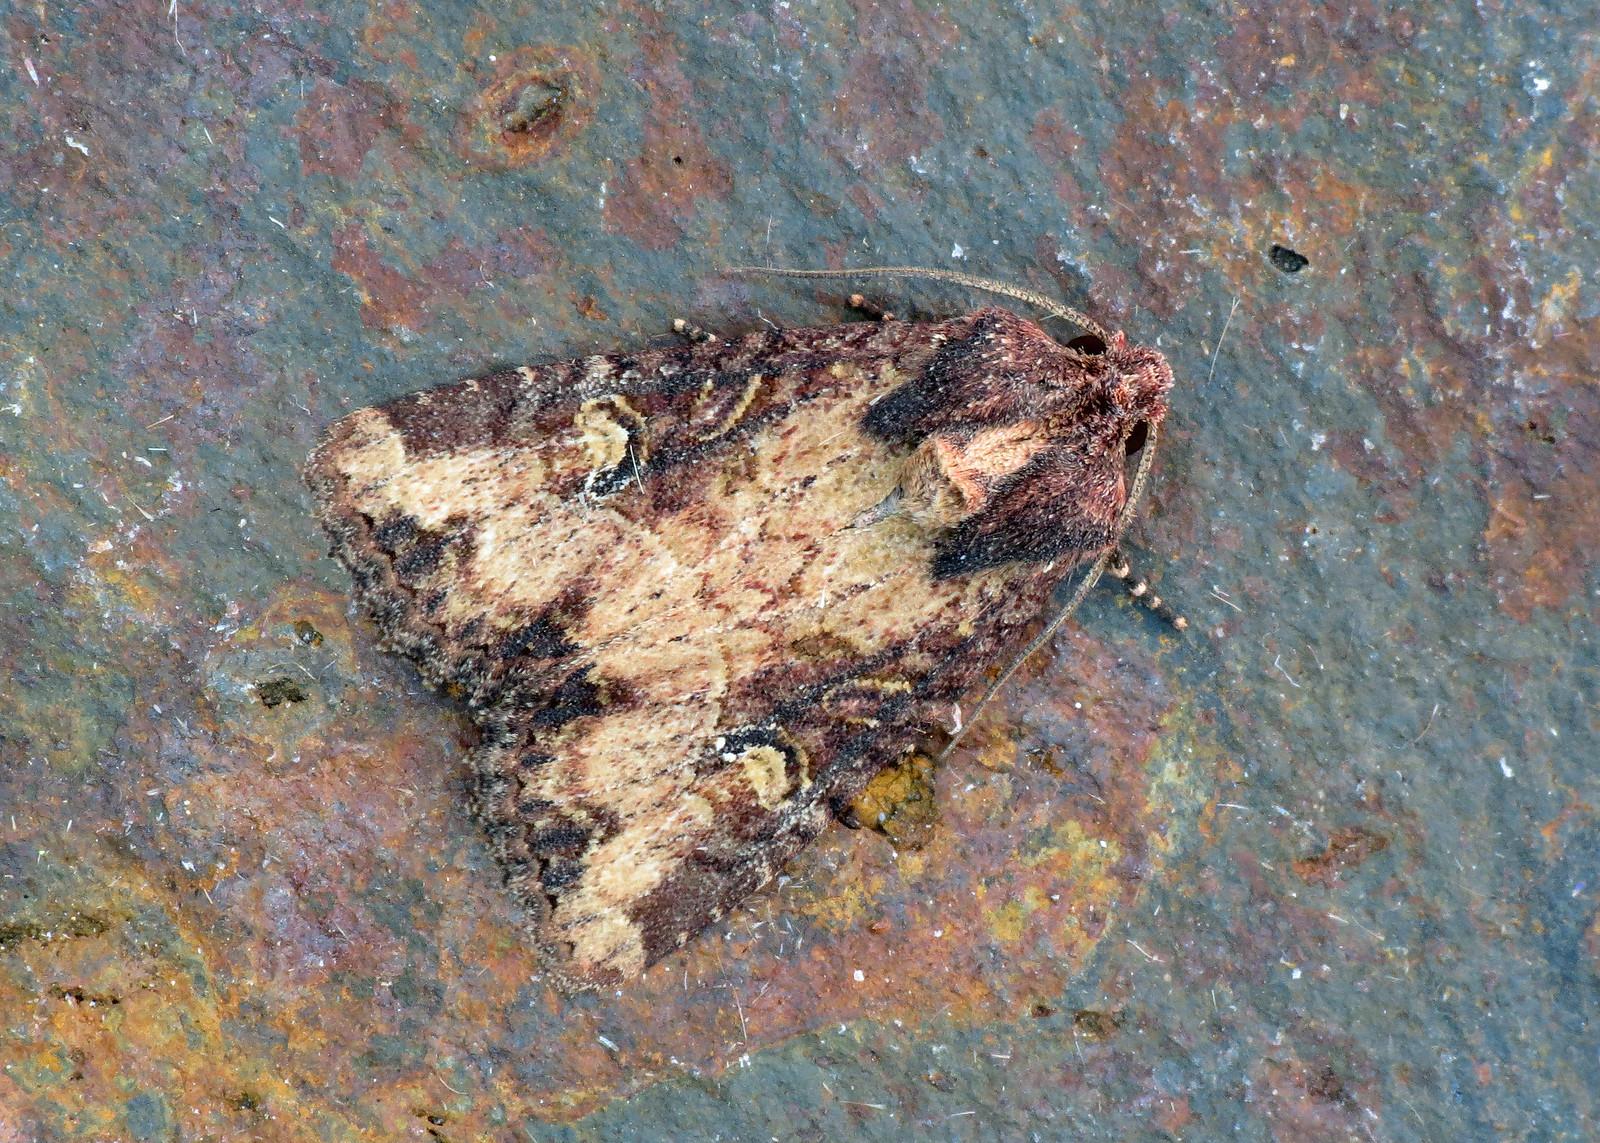 2343 Common Rustic - Mesapamea secalis